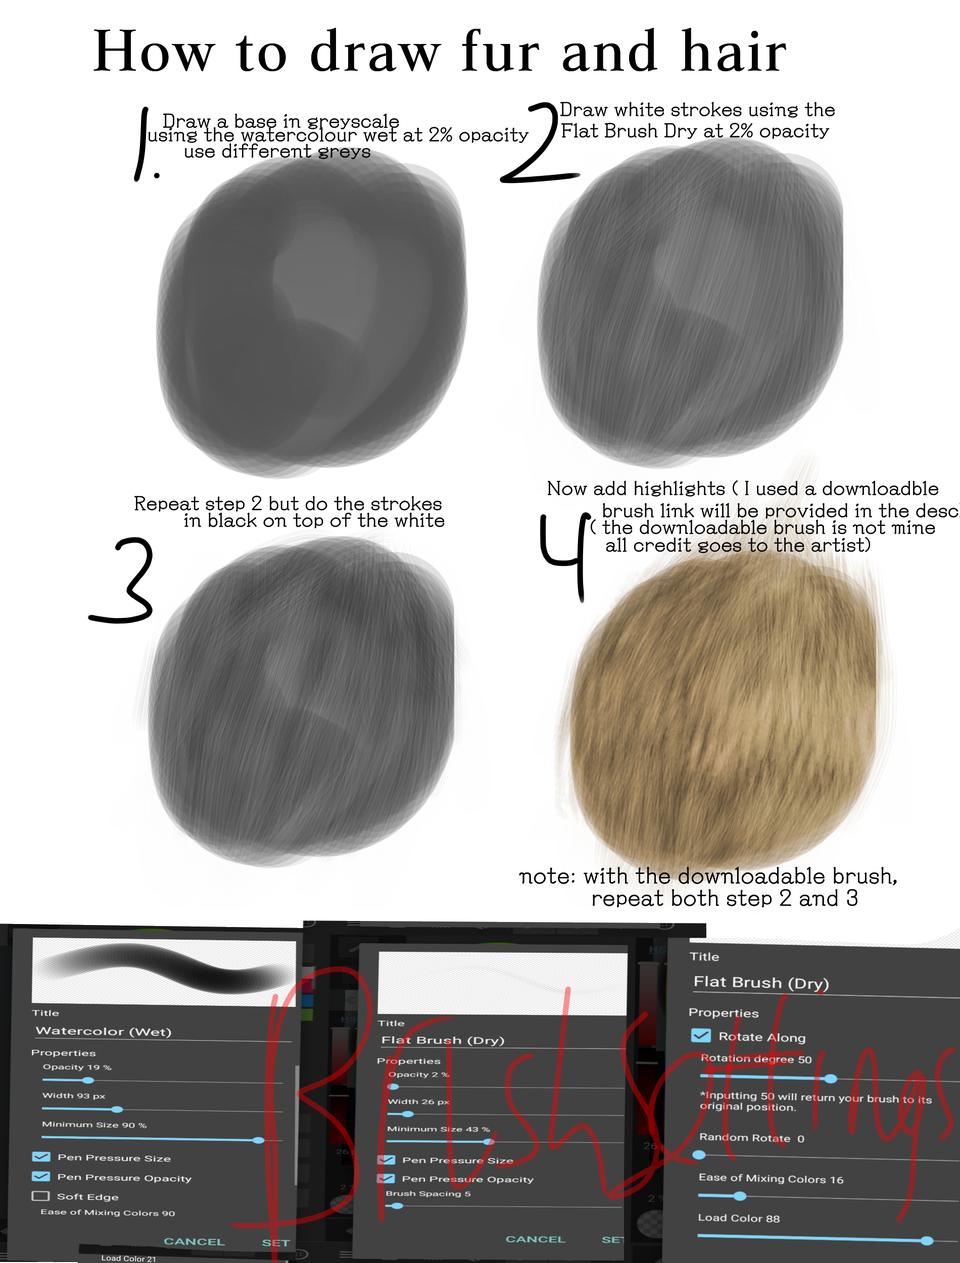 Fur And Hair Tutorial Patchit Illustrations Medibang